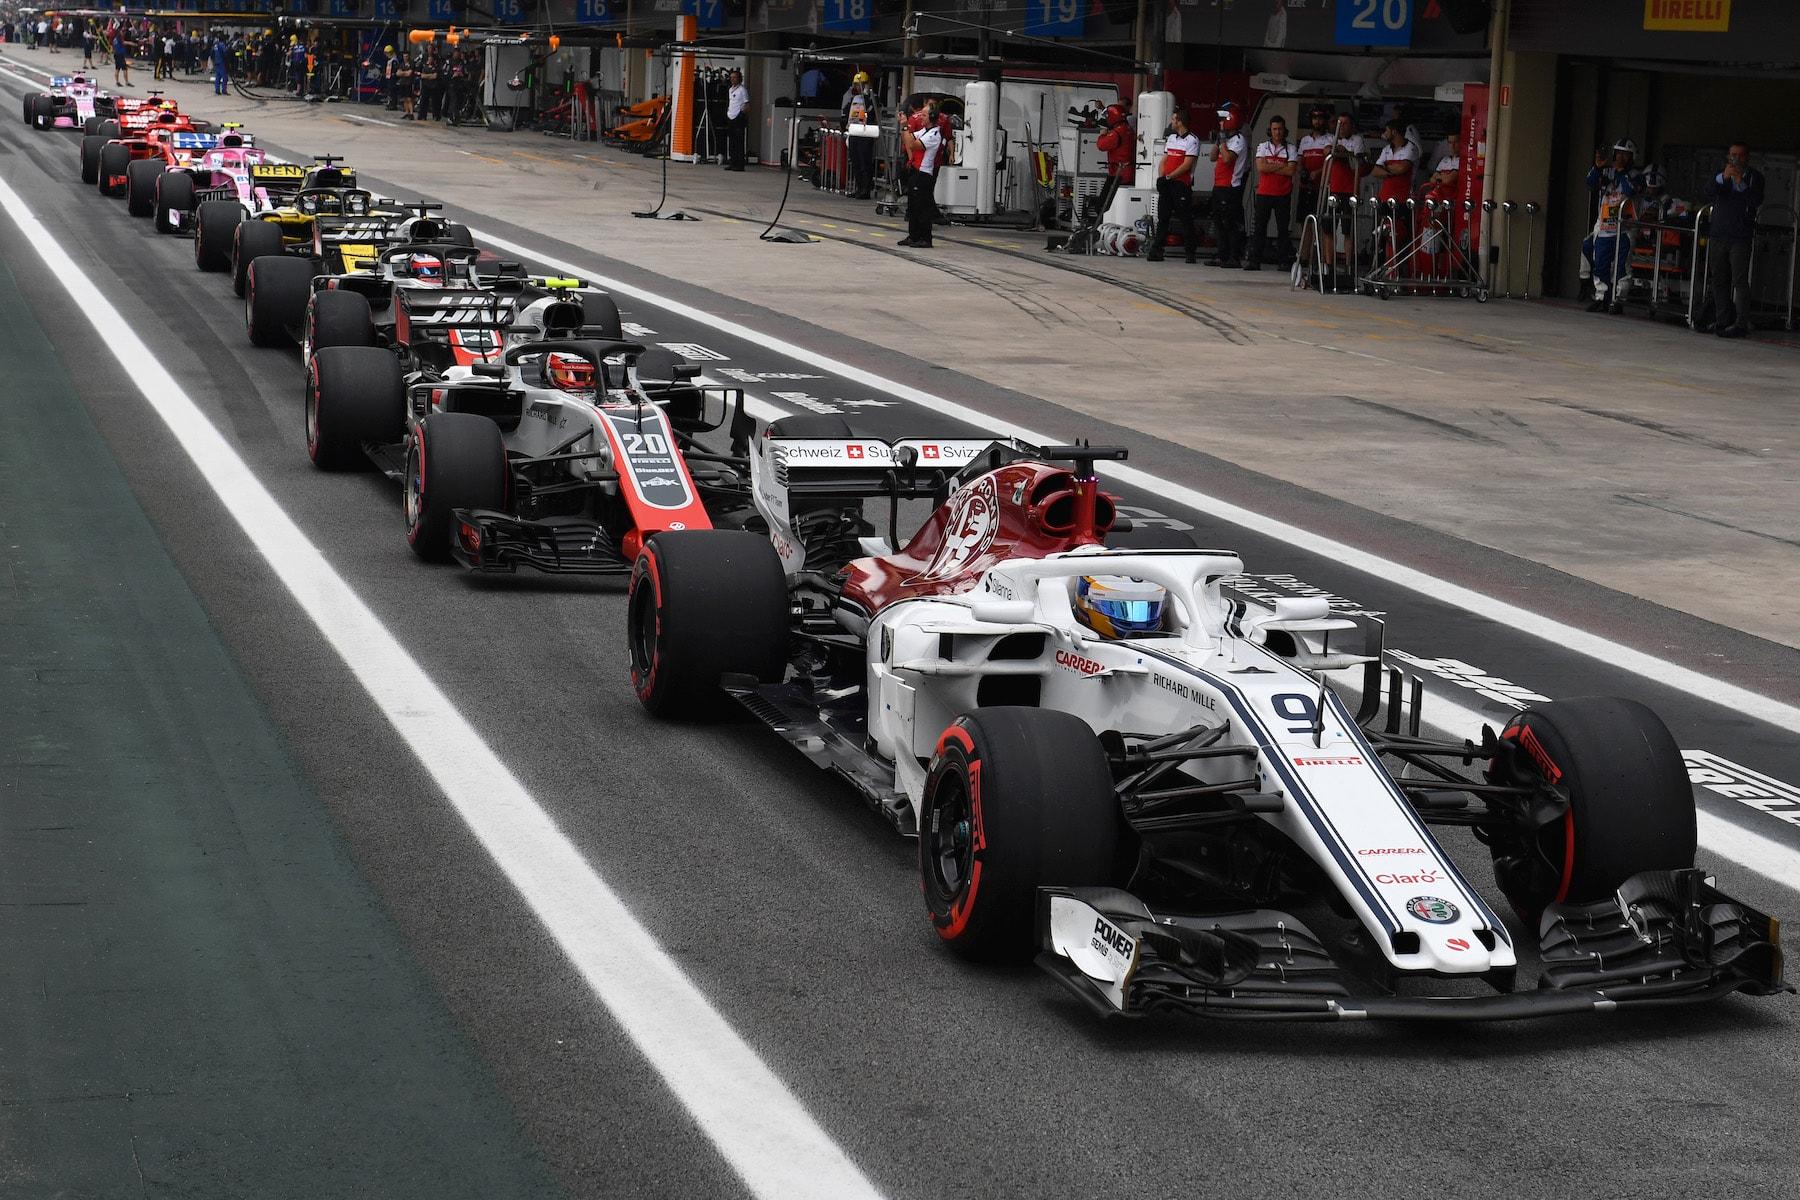 2 2018 Marcus Ericsson | Sauber C37 | 2018 Brazilian GP 1 copy.jpg